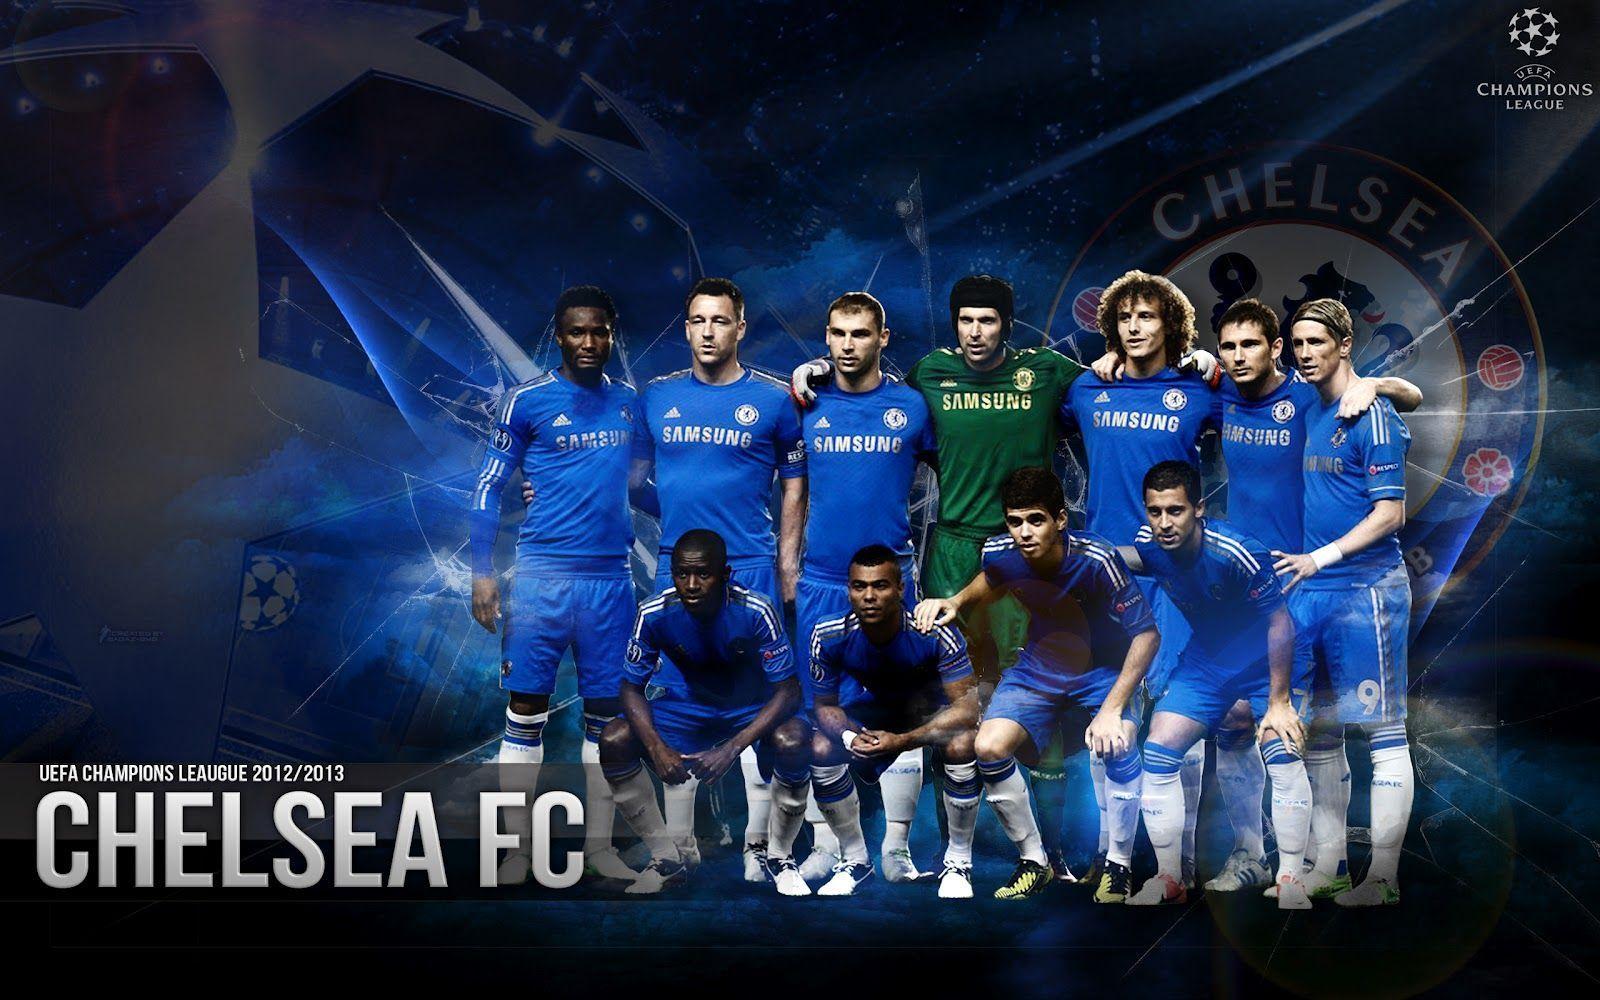 47 Best Chelsea Fc Images On Pinterest: Football Wallpapers Chelsea FC Wallpaper